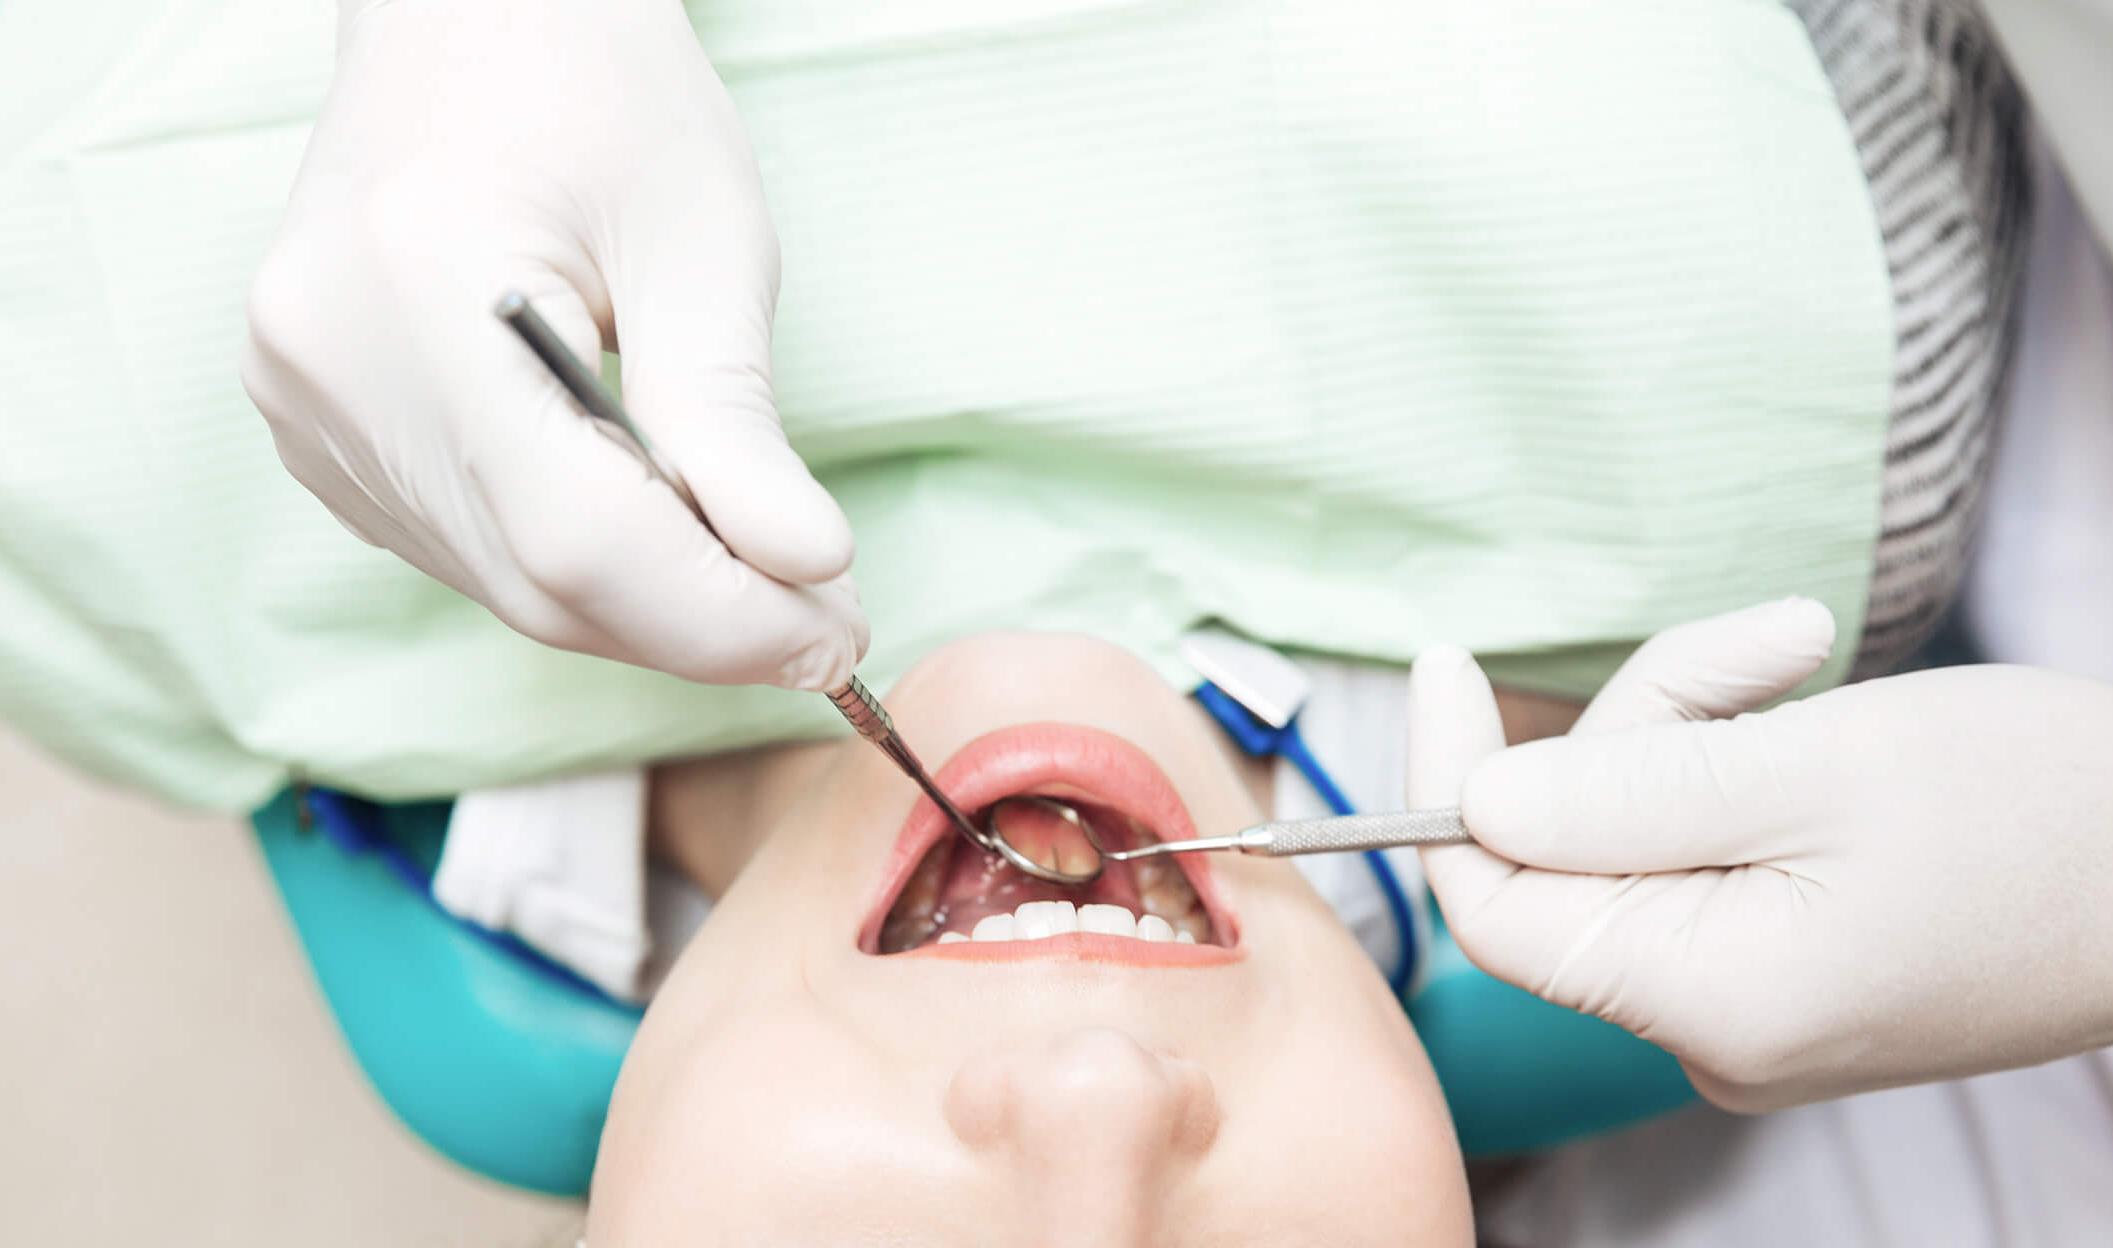 endodoncia-clinik-tj-clinica-dental-tijuana